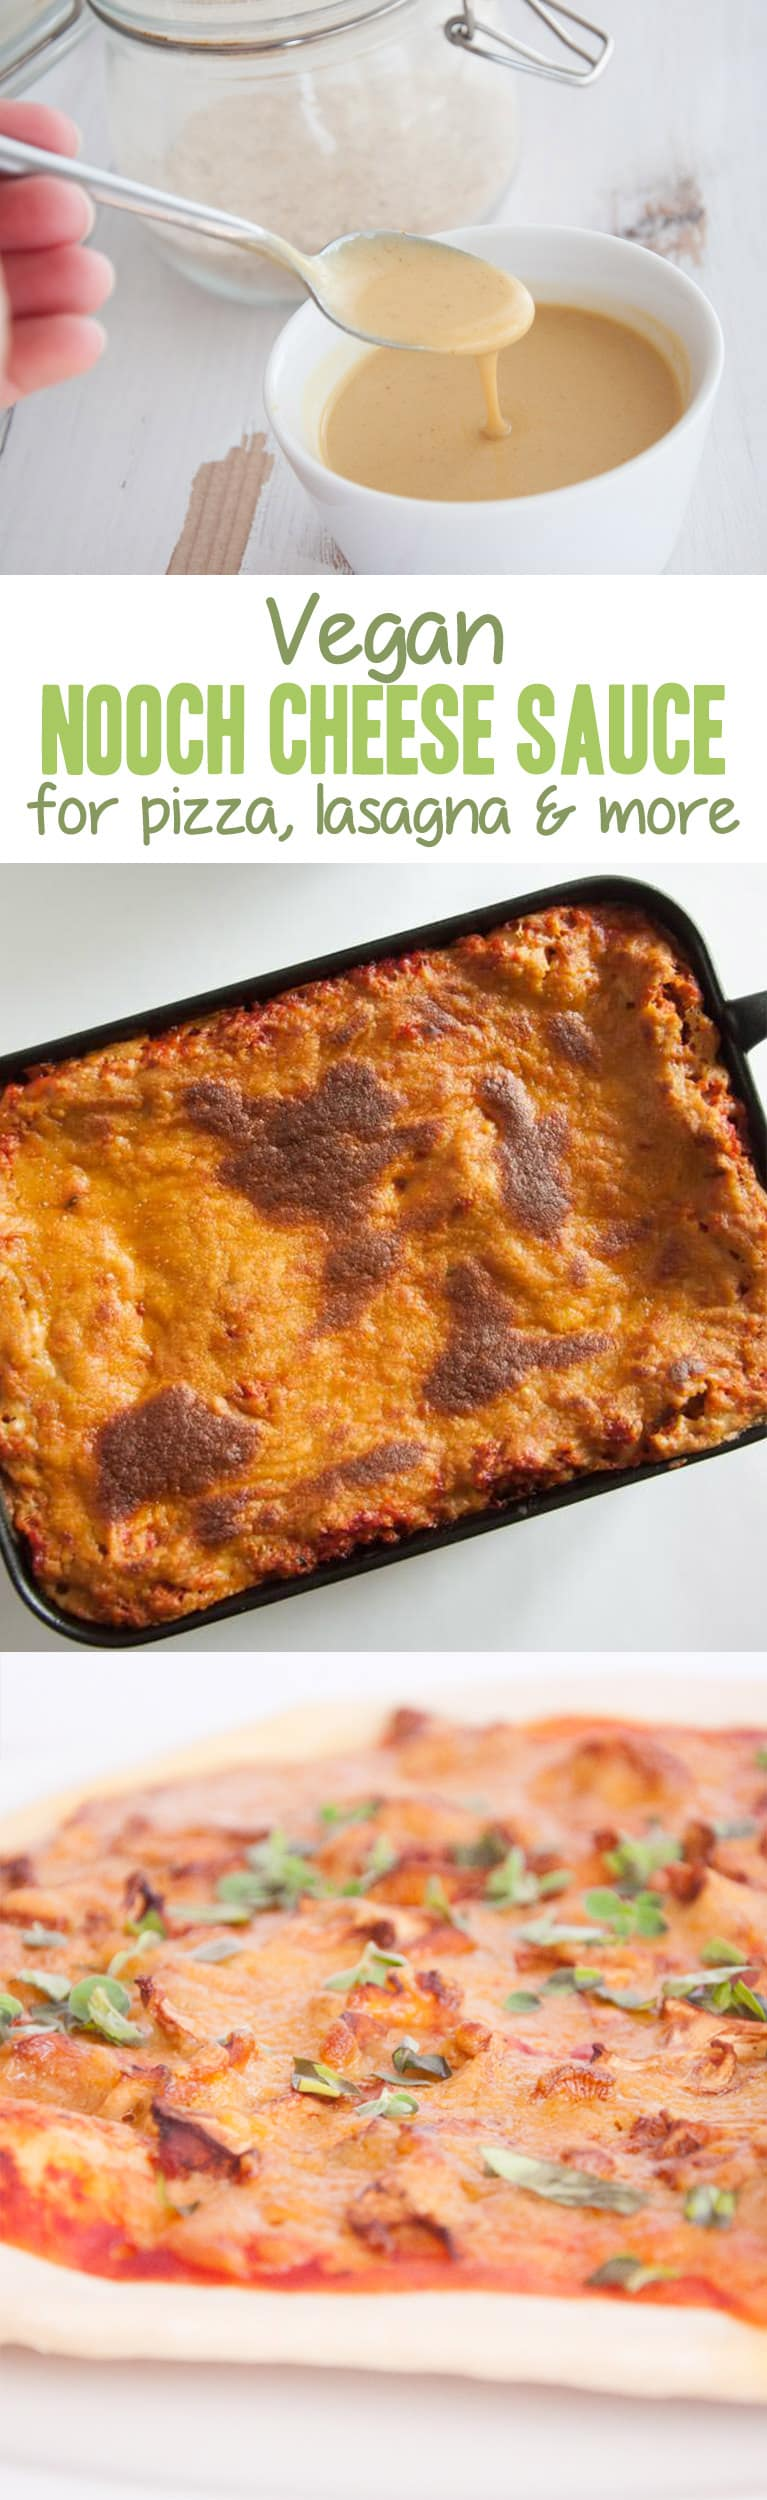 Nooch Cheese Sauce - vegan   ElephantasticVegan.com